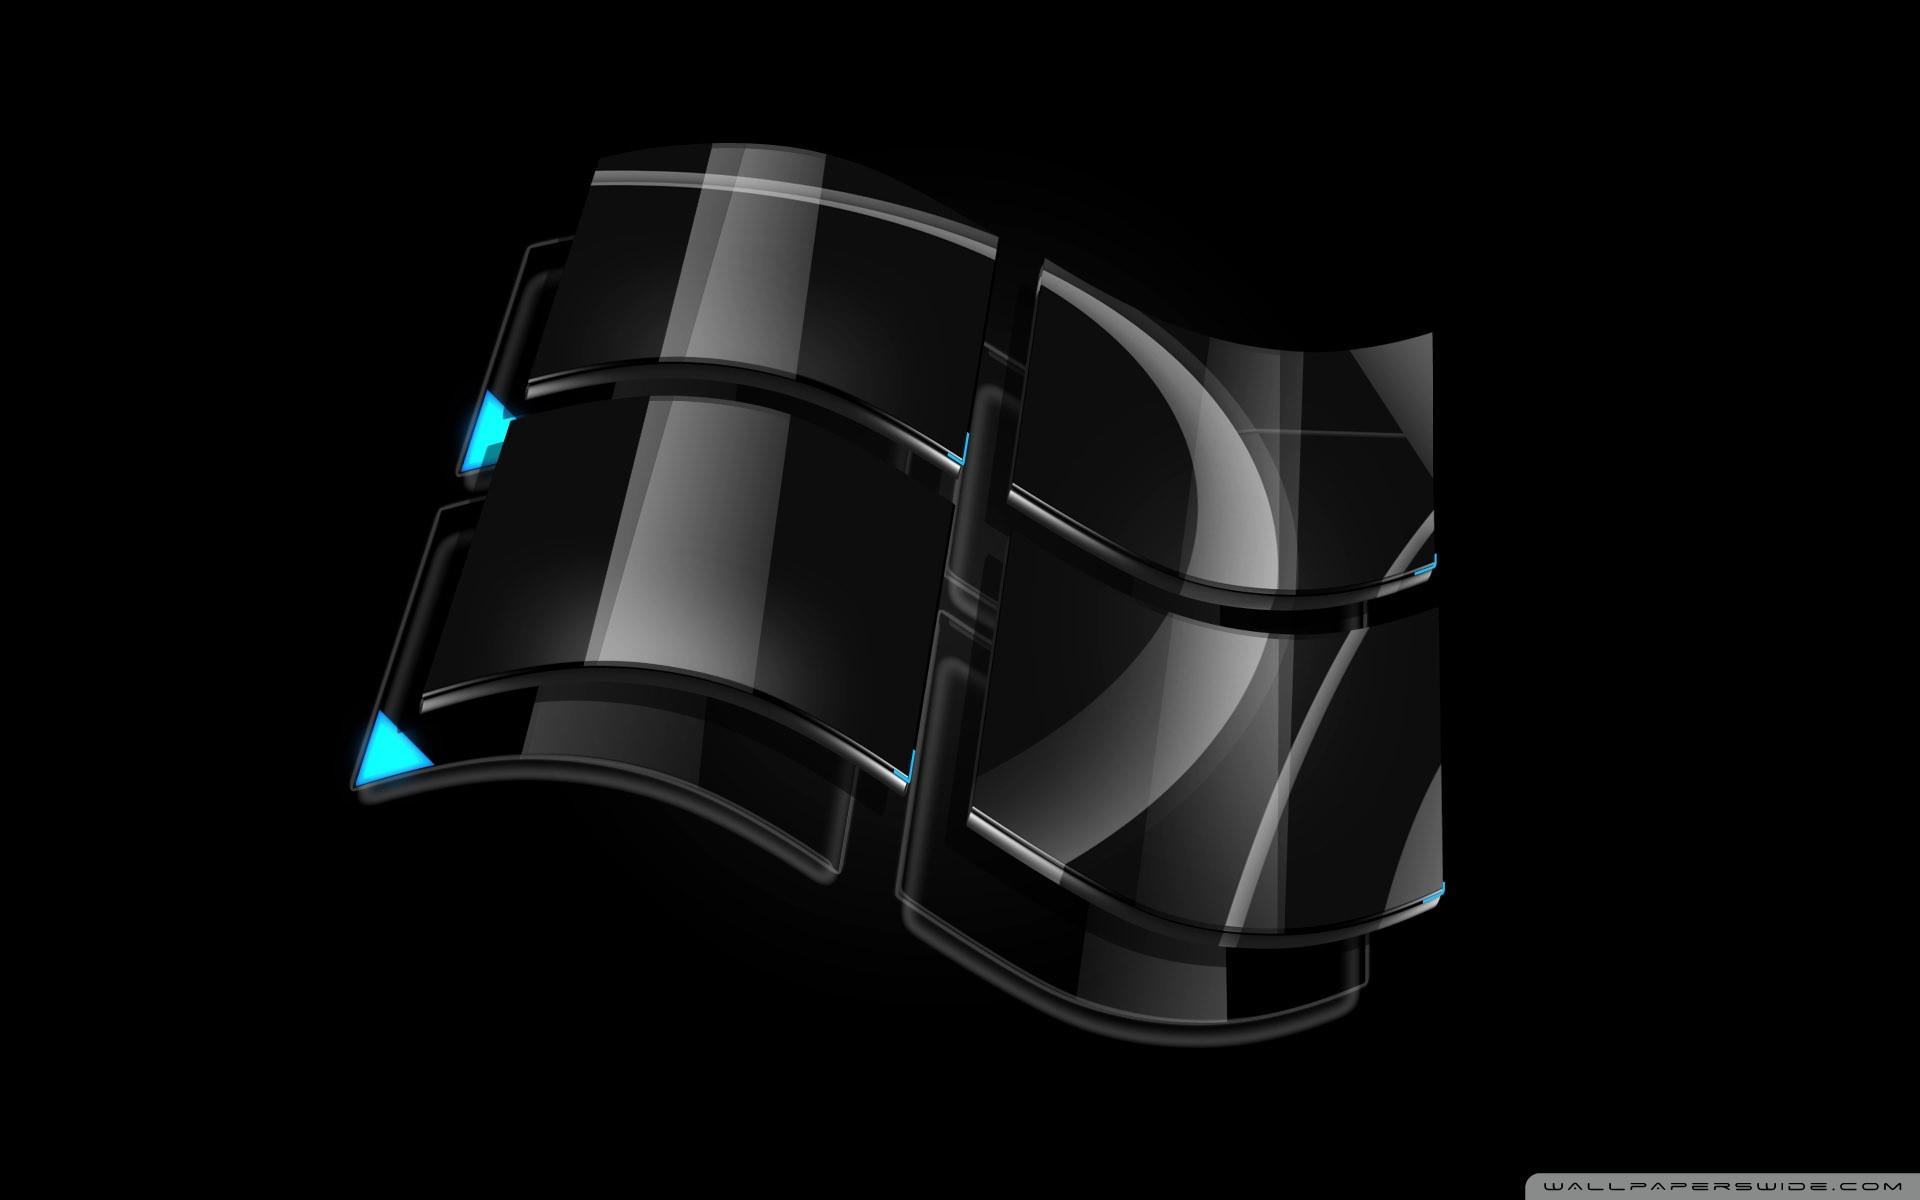 Windows Vista Aurora Standard Hd Wallpapers Desktop